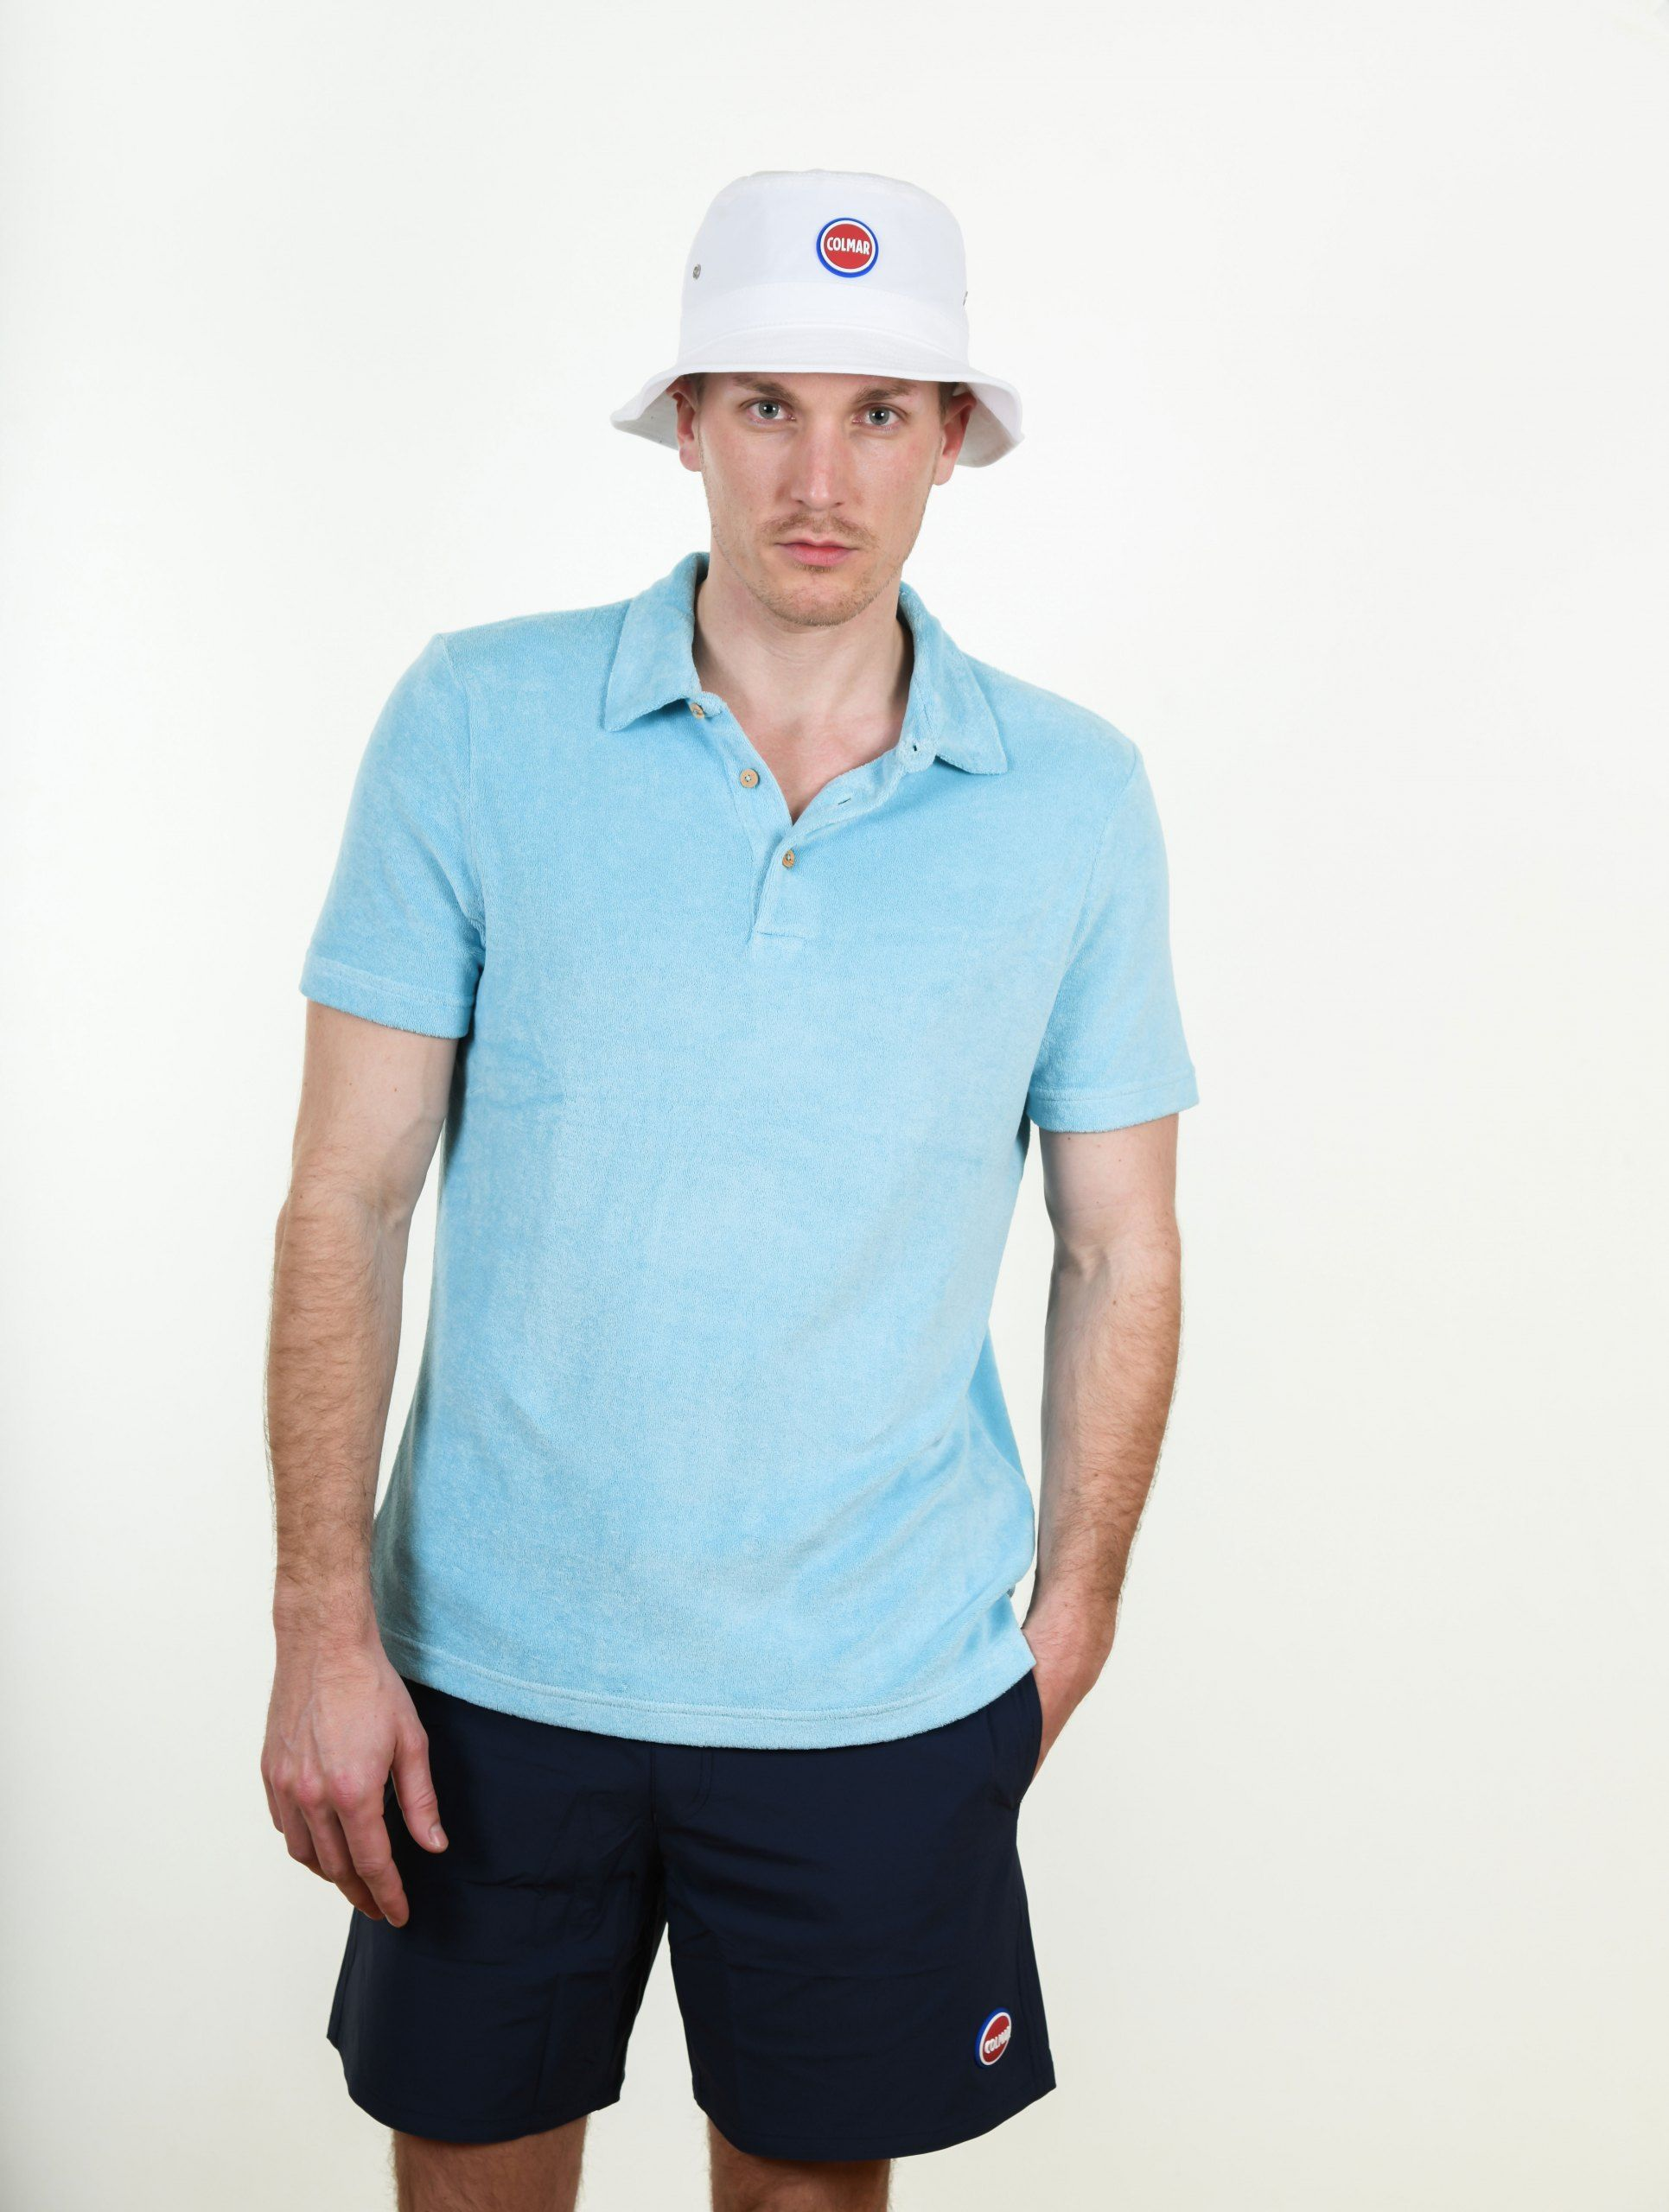 Poloshow Colmar Hat White 01 5074 8WF 7